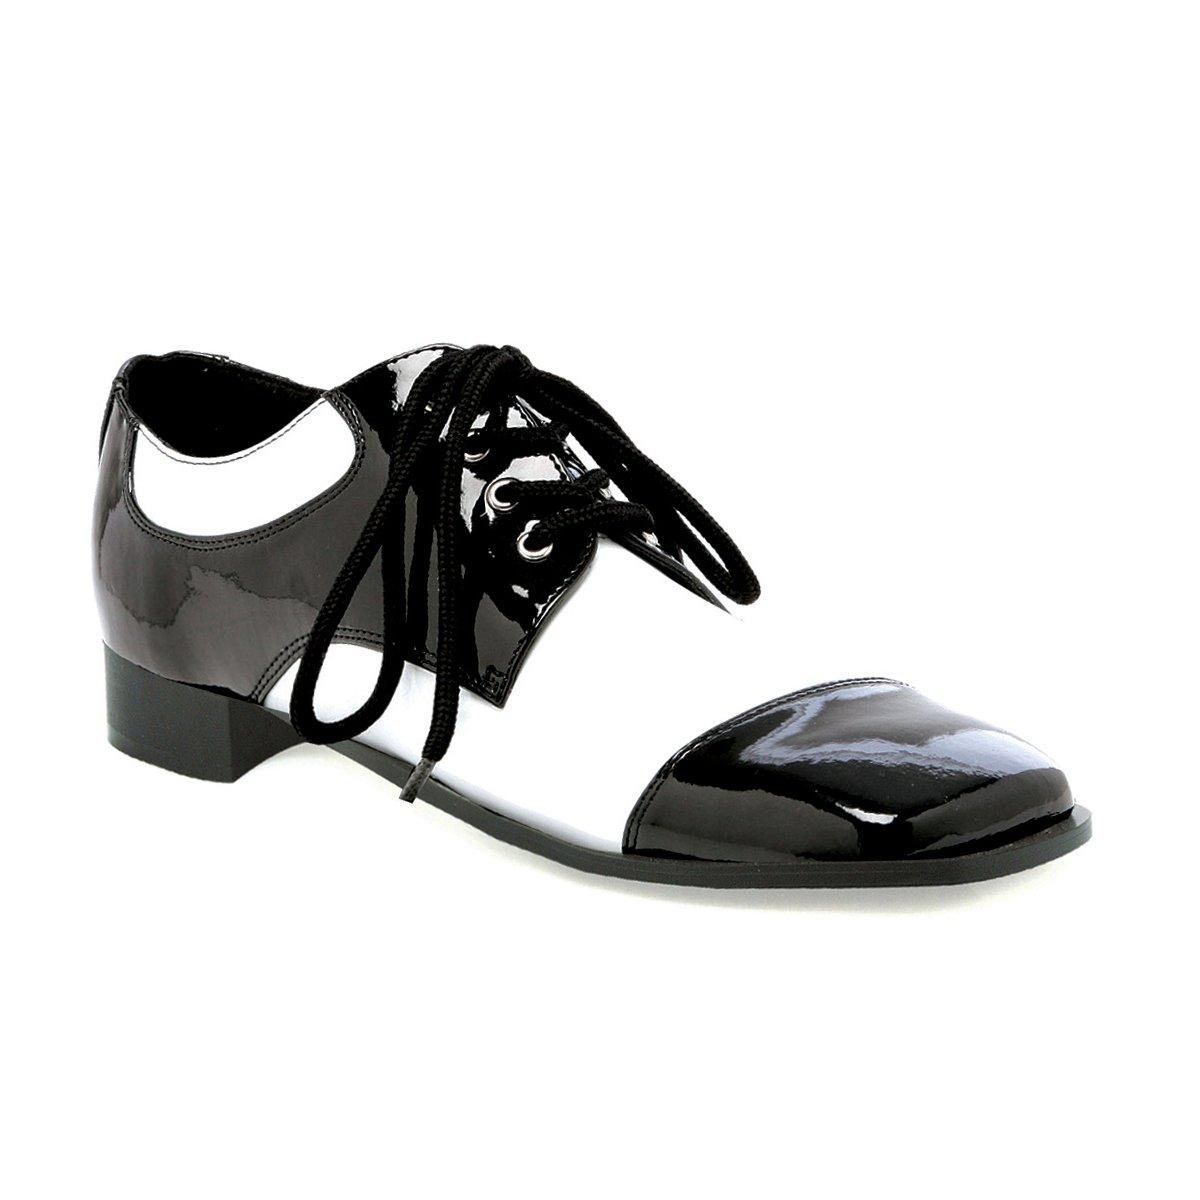 Ellie Shoes Men's 1''Heel Black and White Shoe. Sizes) M BLKW